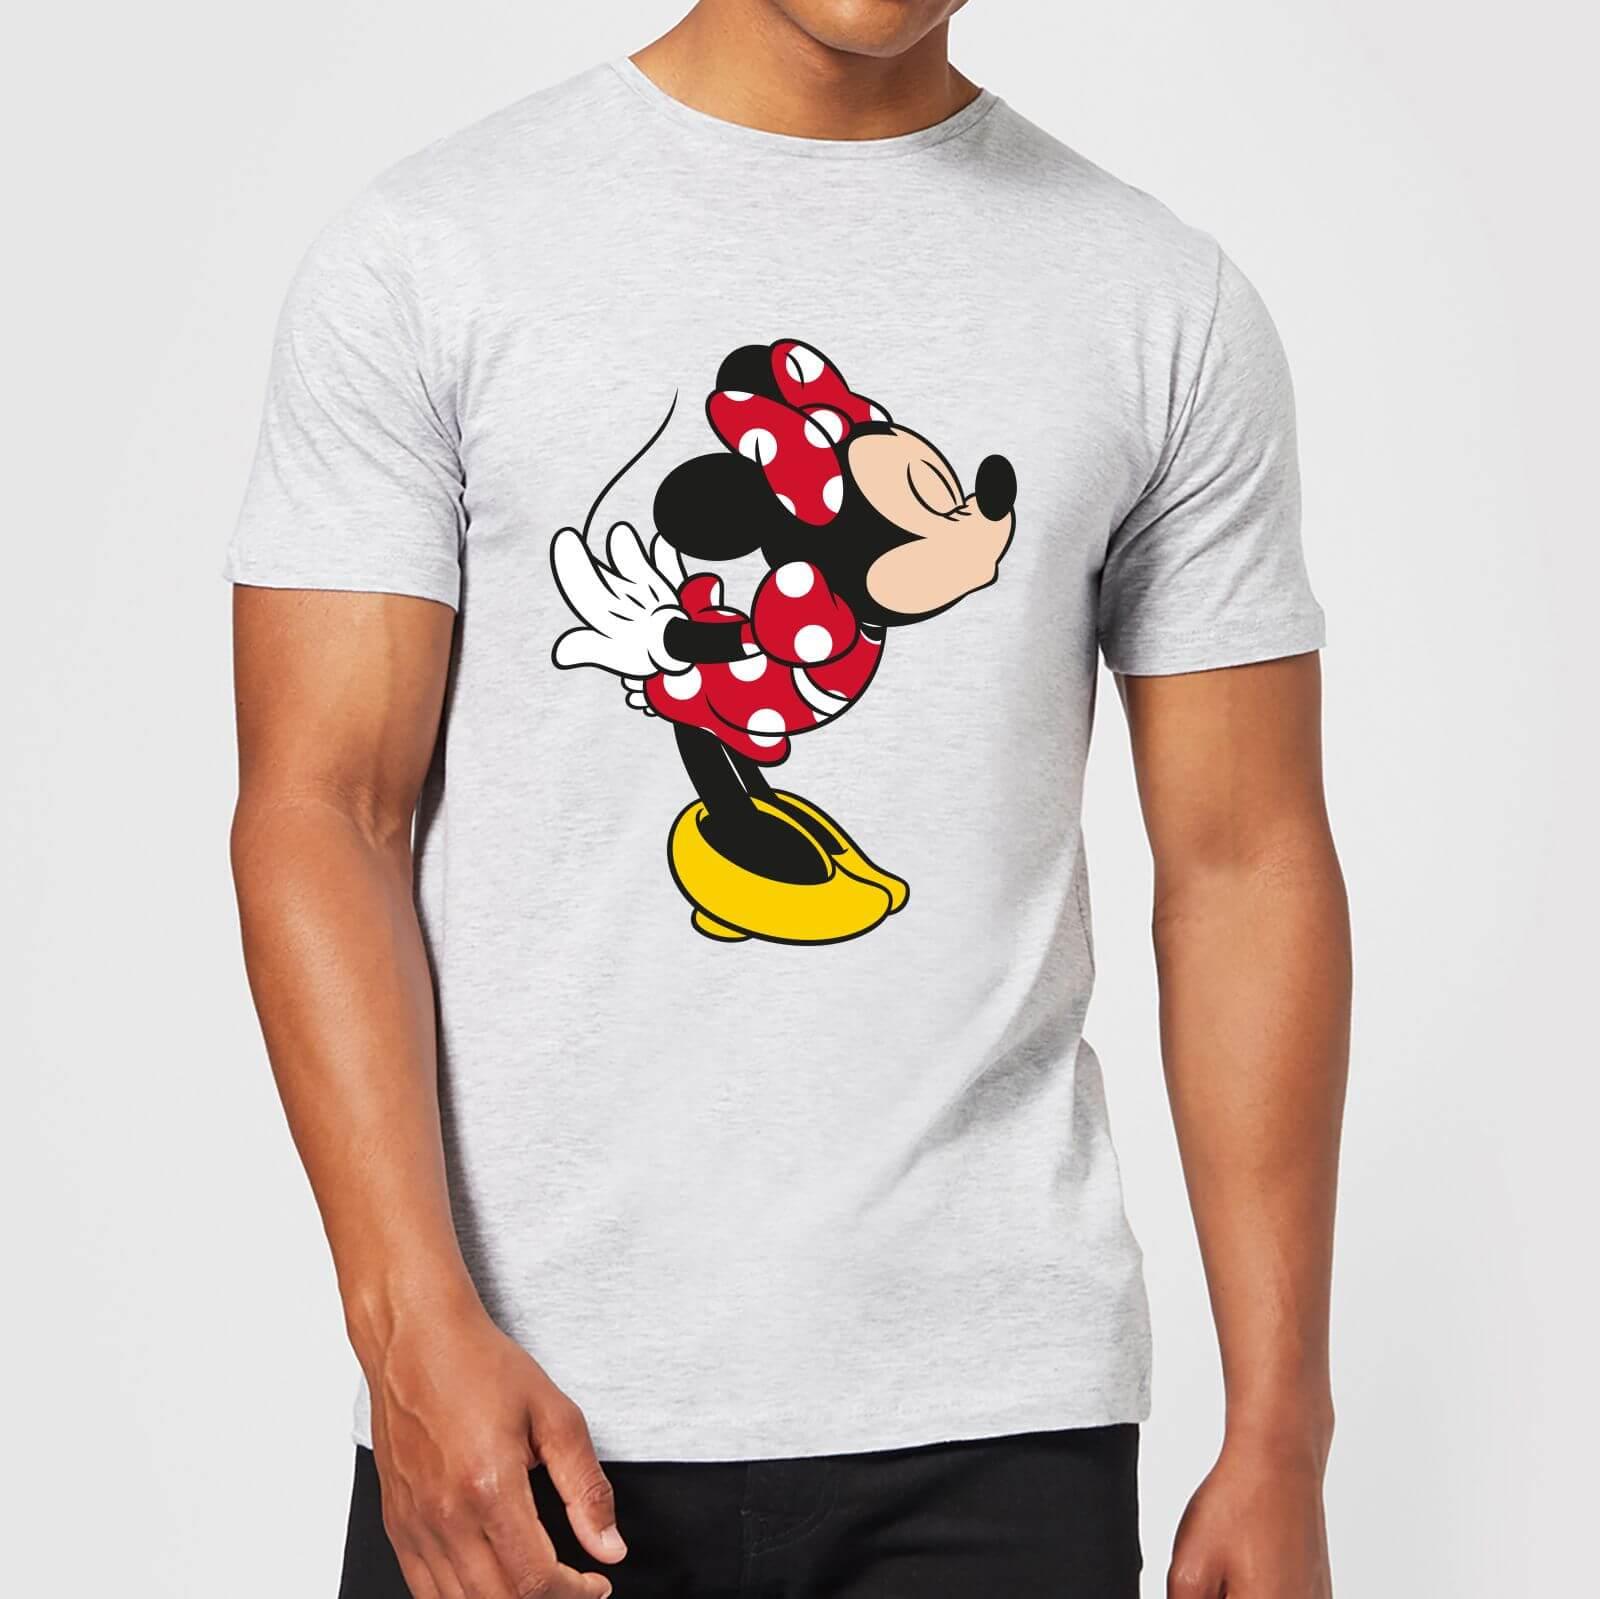 Disney Disney Mickey Mouse Minnie Split Kiss T-Shirt - Grey - 5XL - Grey